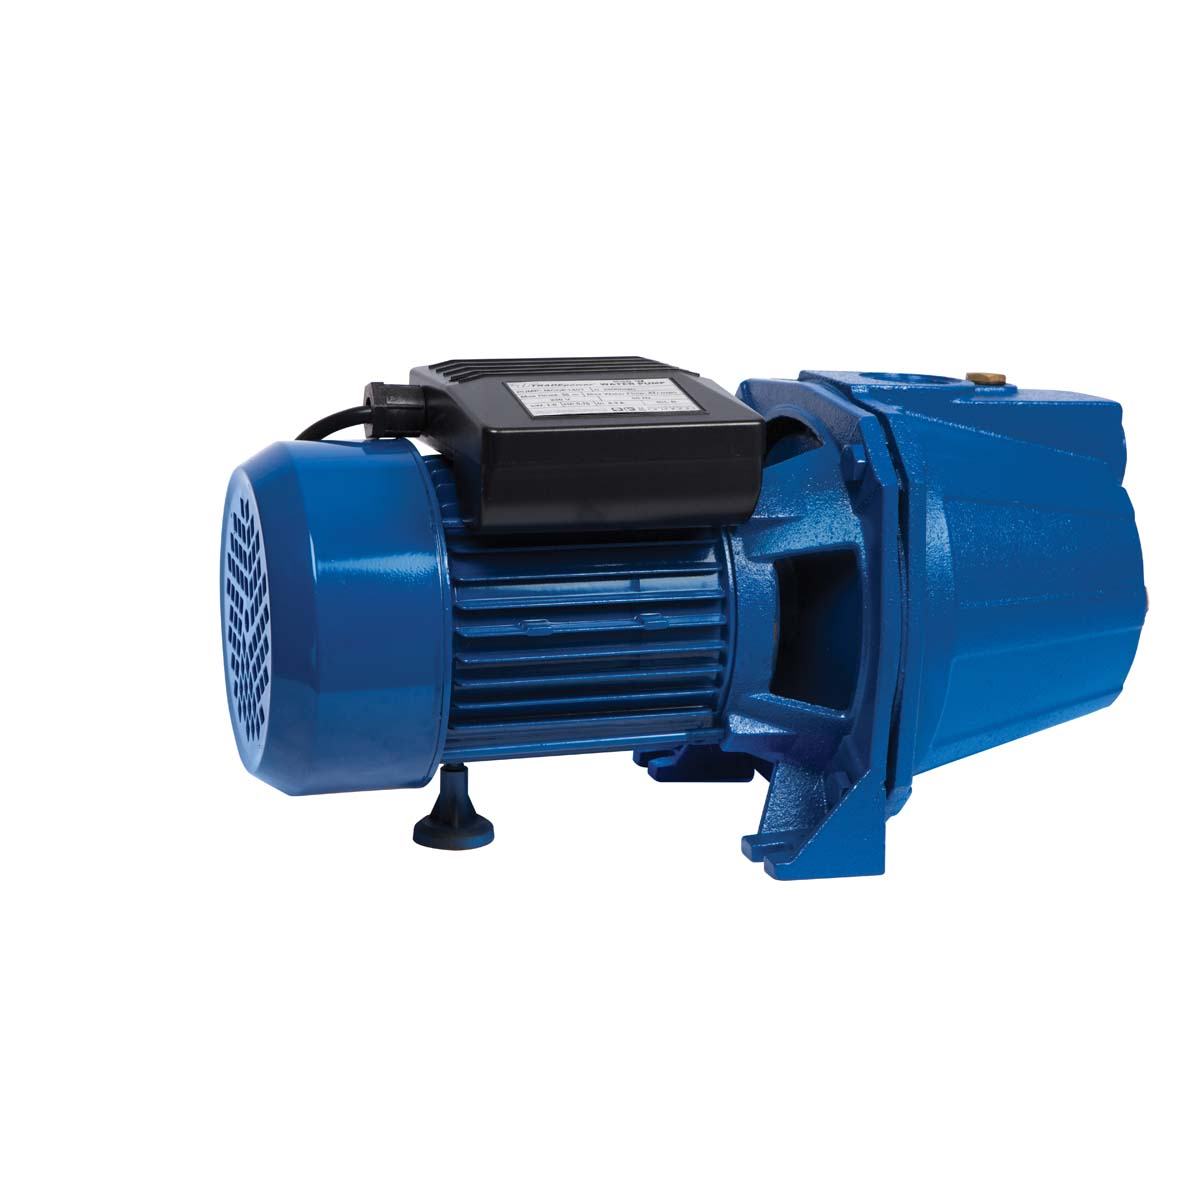 Water Pump Hp Jet Motor L Ools